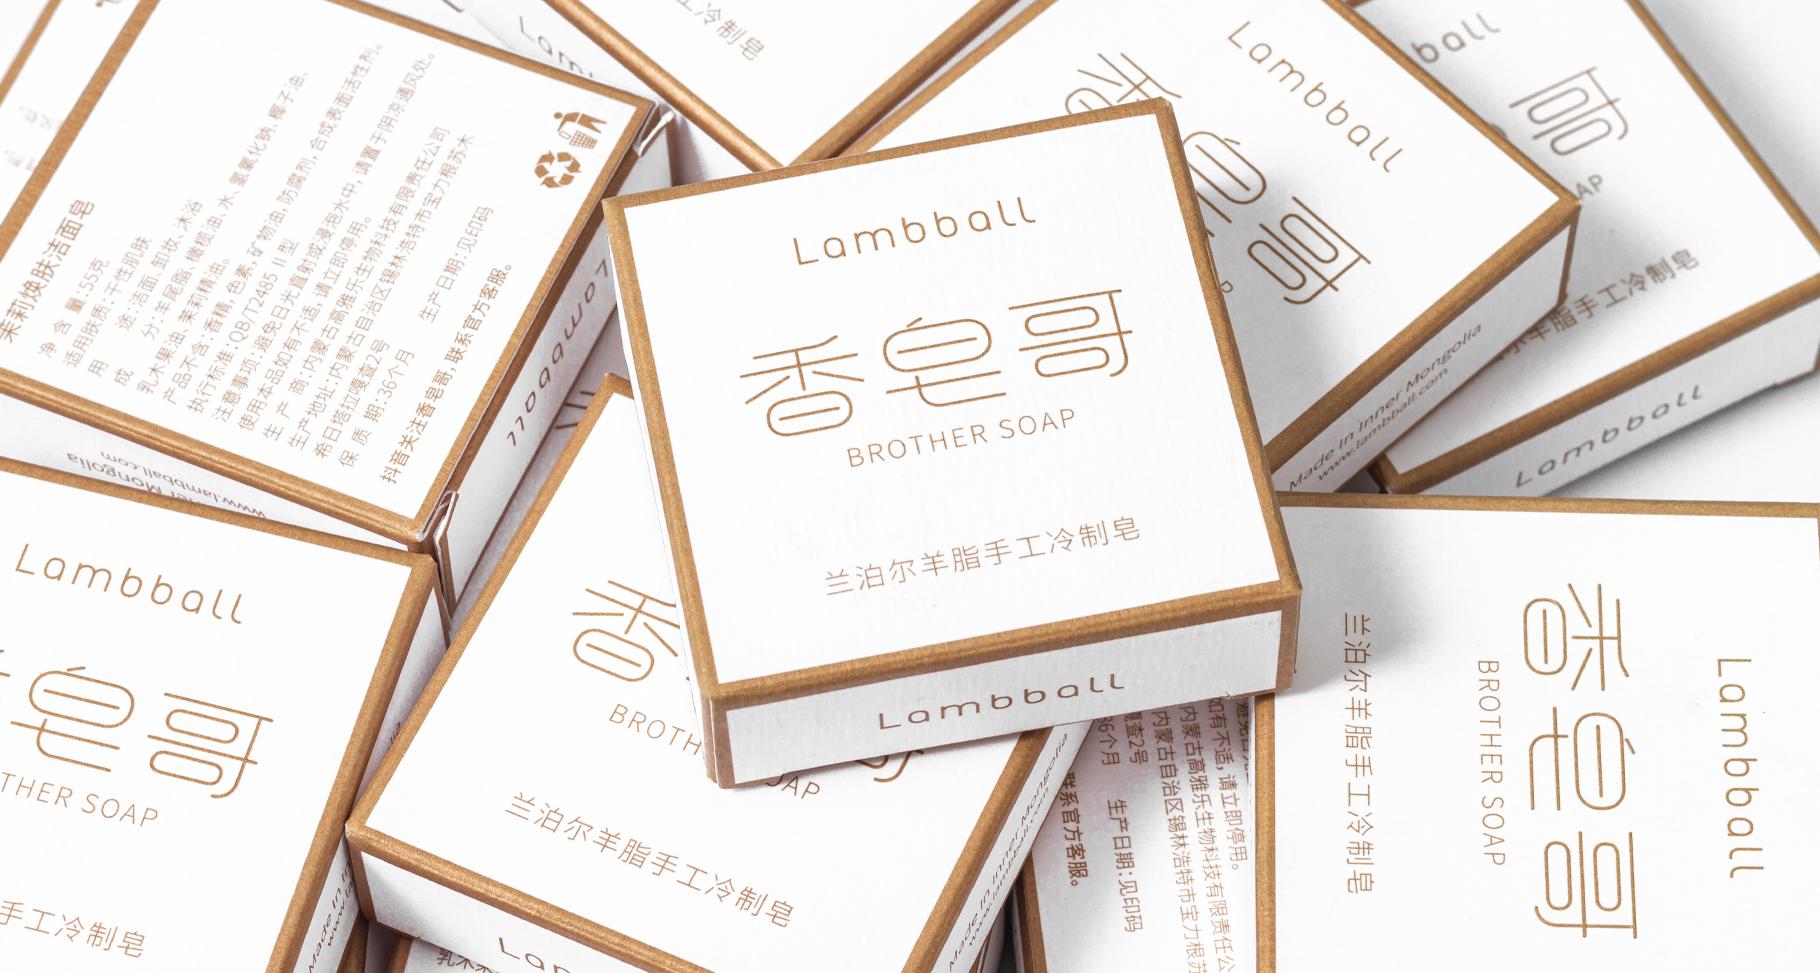 lambball品牌系列产品包装设计 第9张